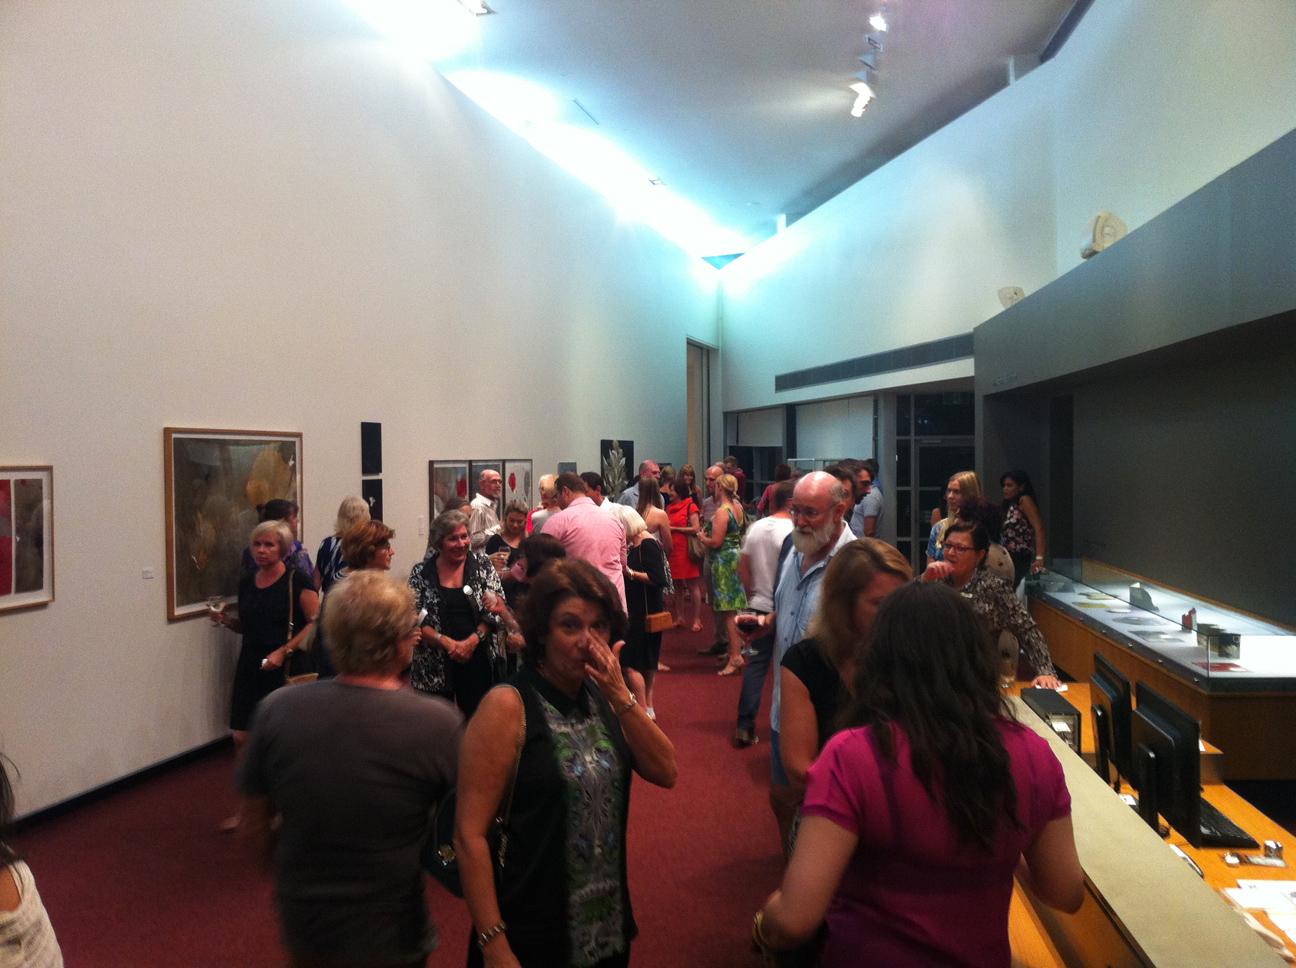 Artspace foyer gallery, opening night